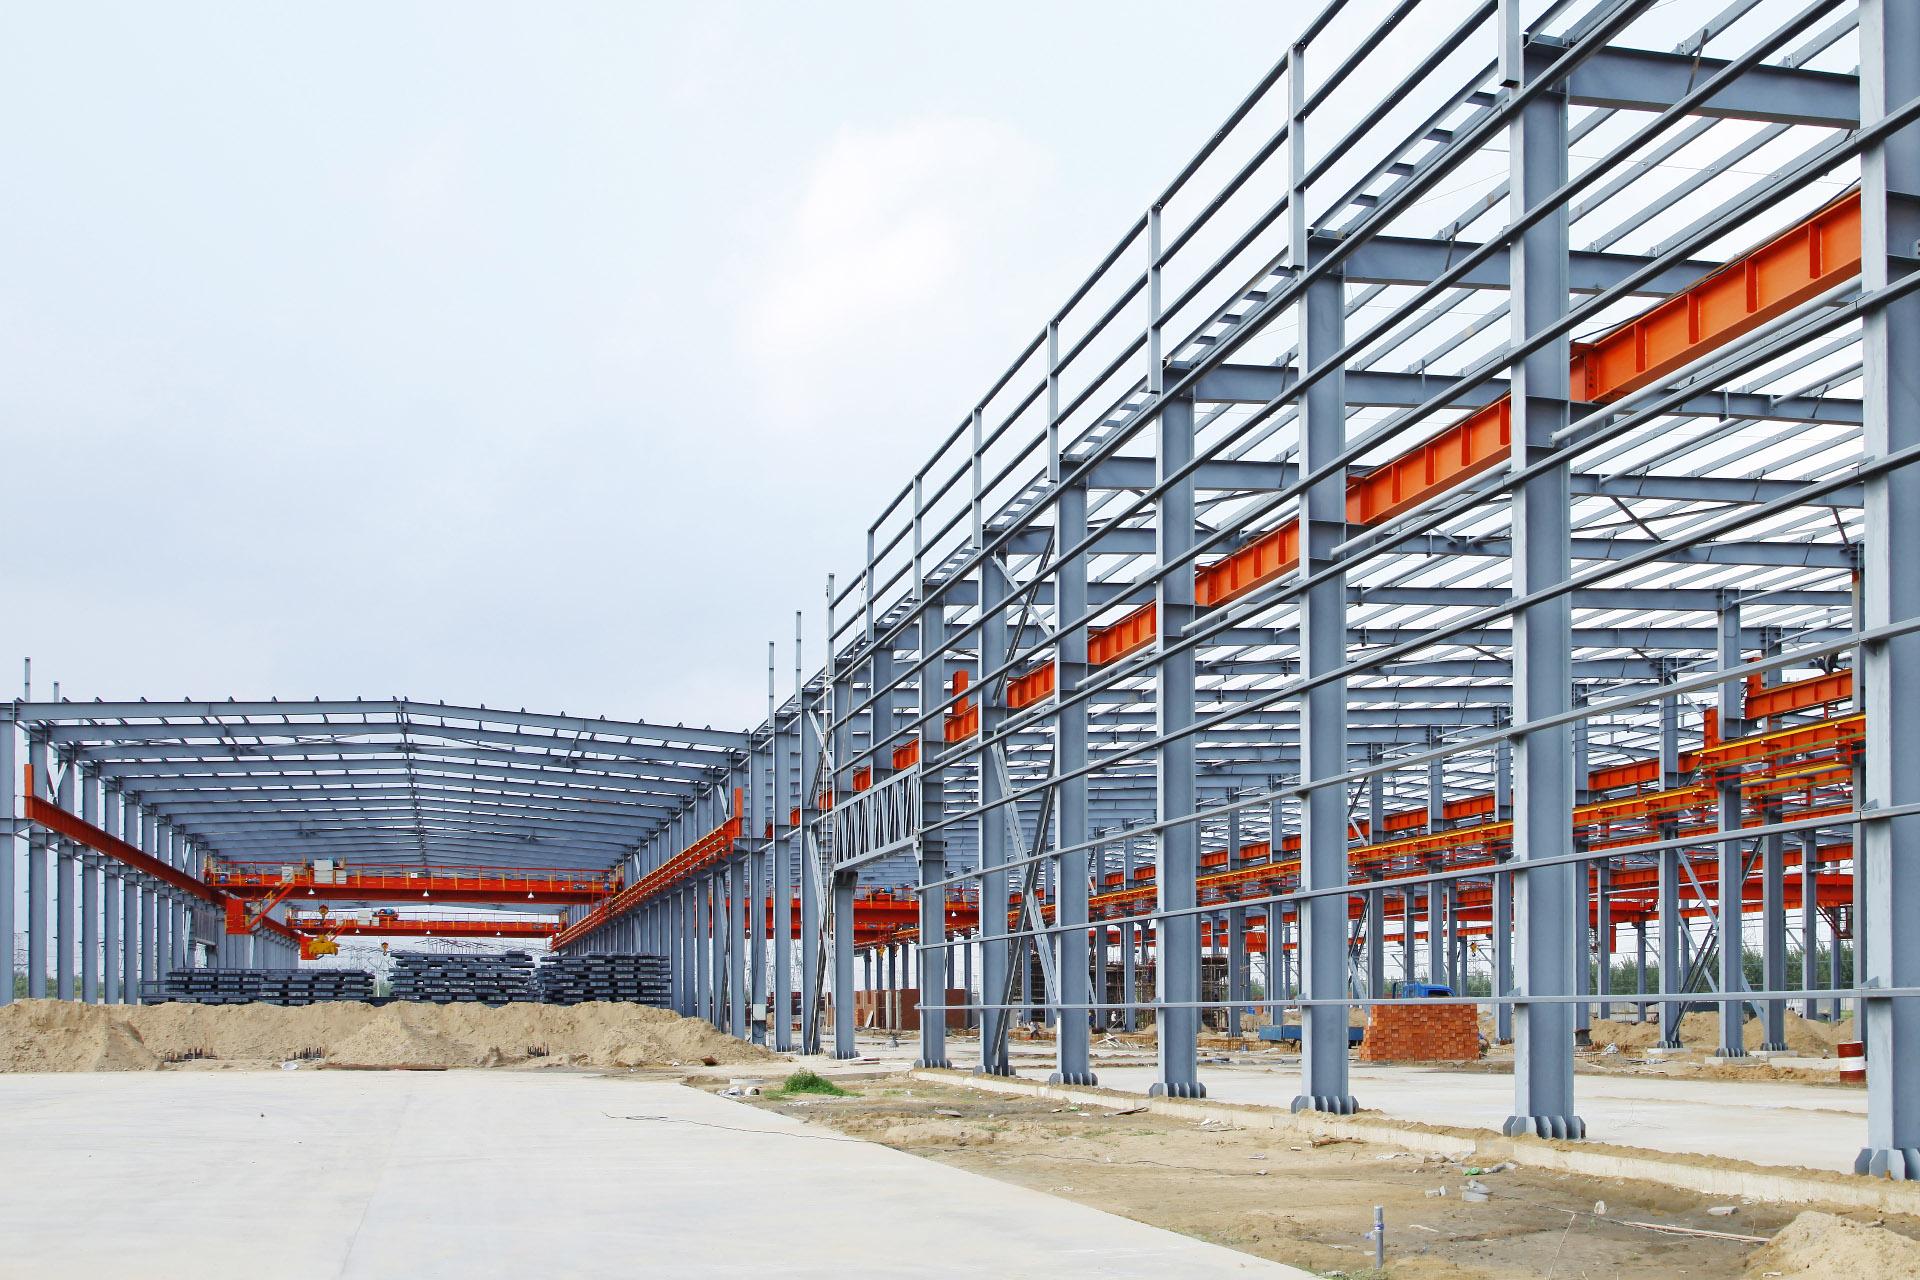 Hallenbau aus Stahl